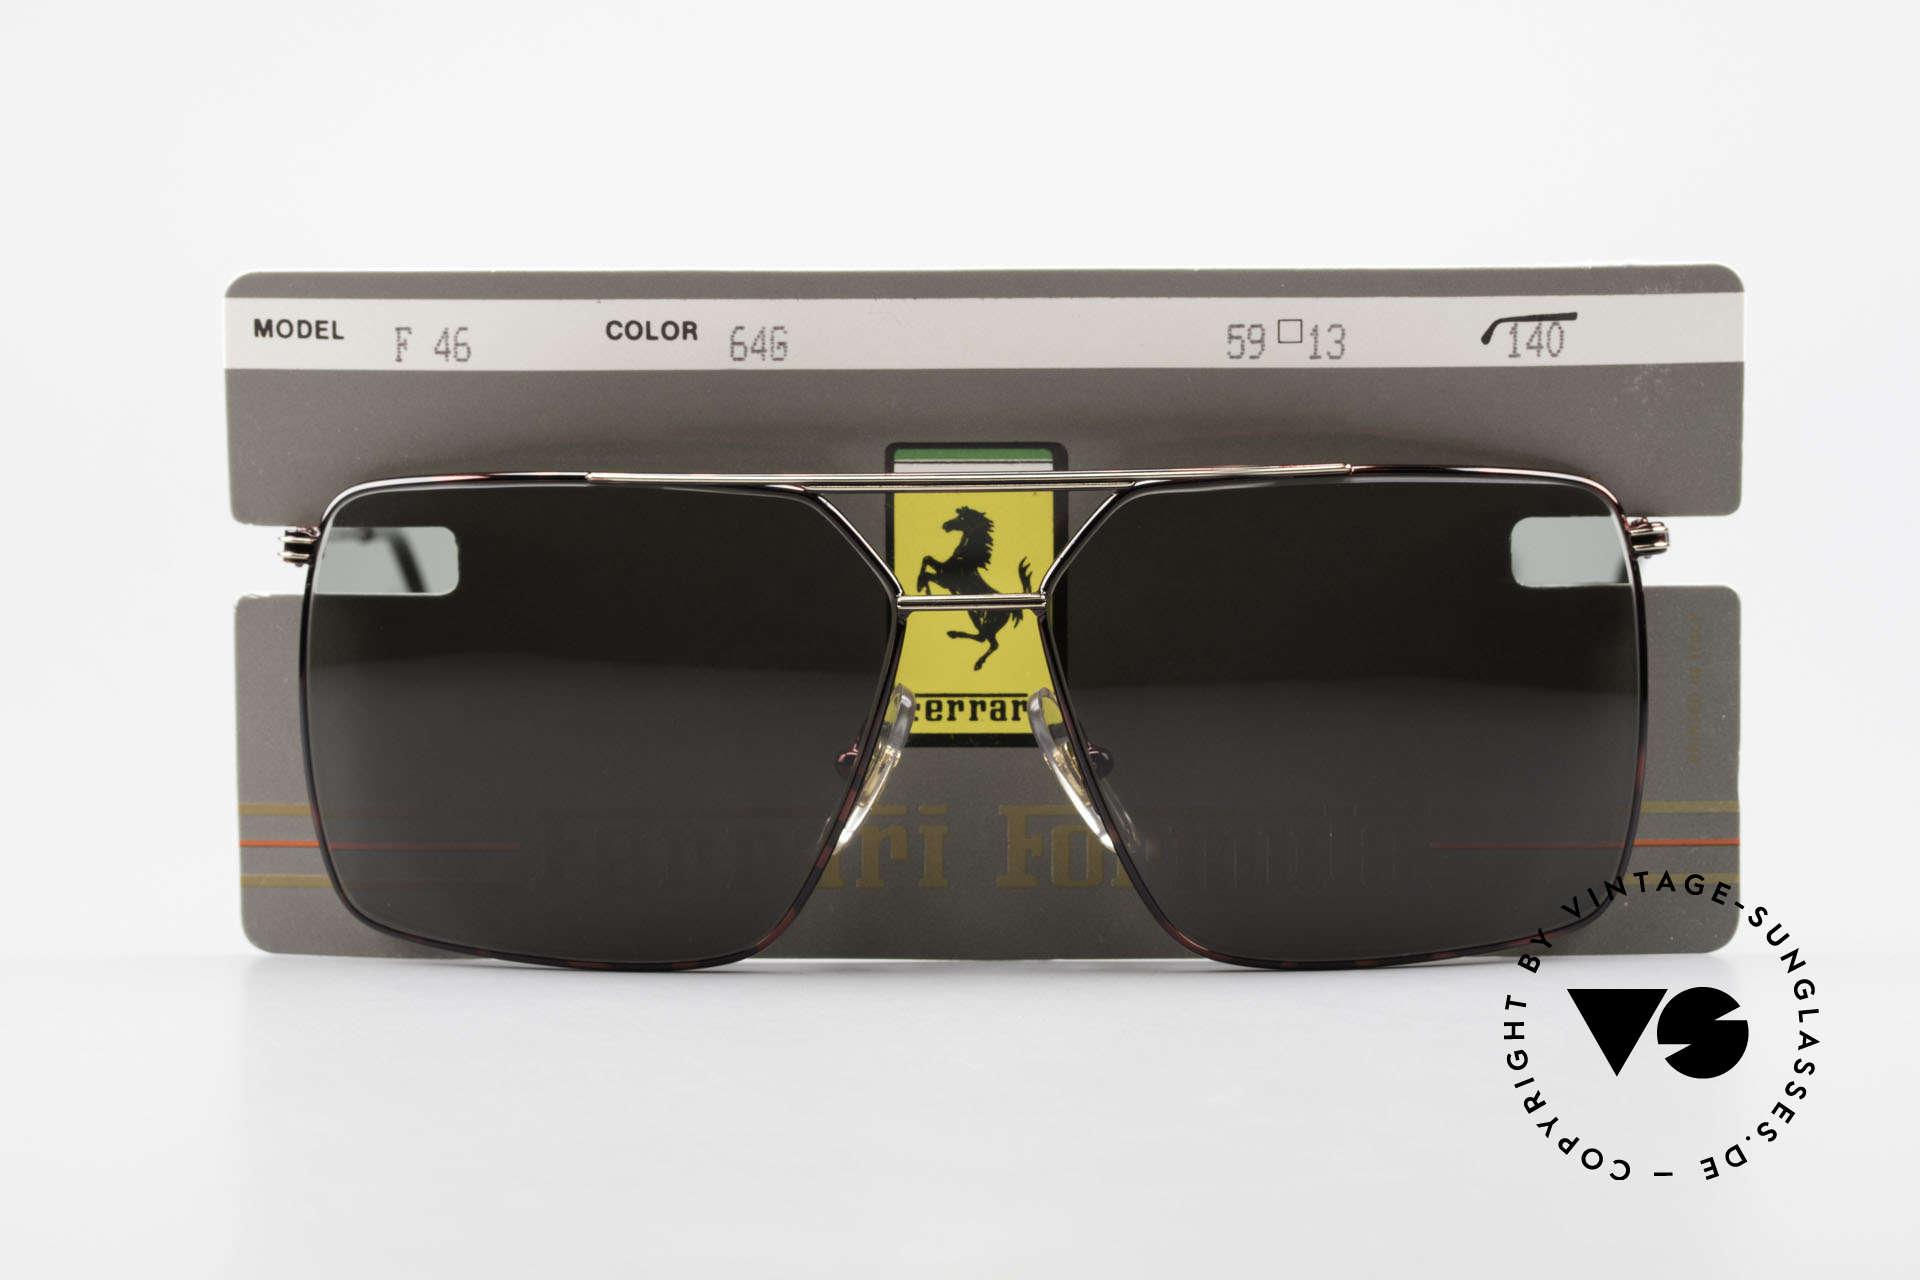 Ferrari F46 Ferrari Formula 1 Sunglasses, Size: medium, Made for Men